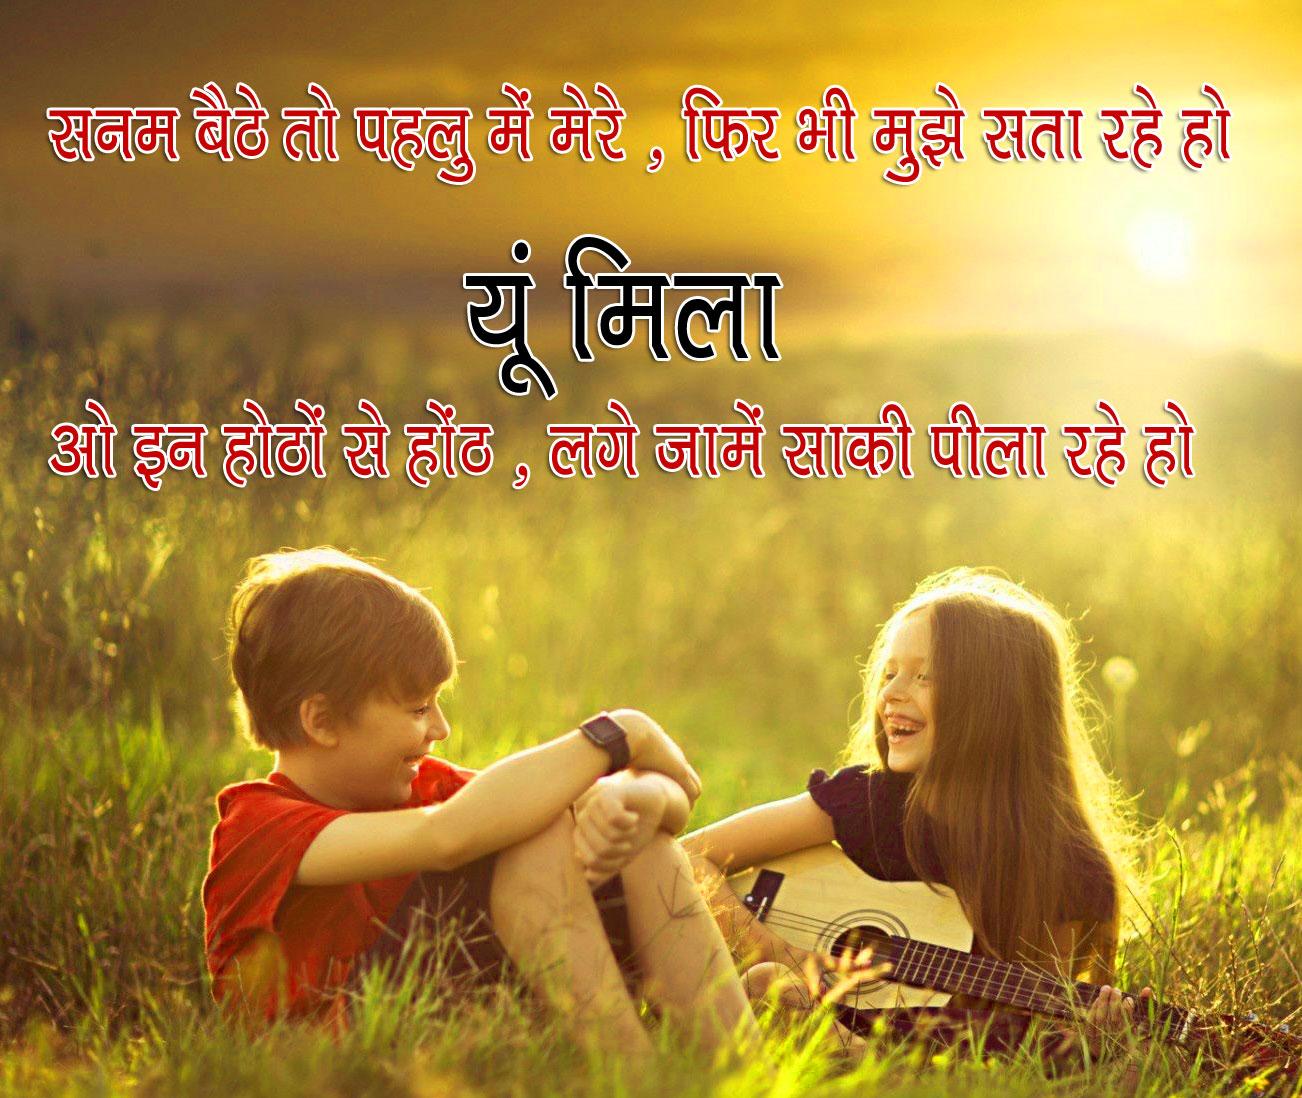 Best Hindi Shayari Images 5